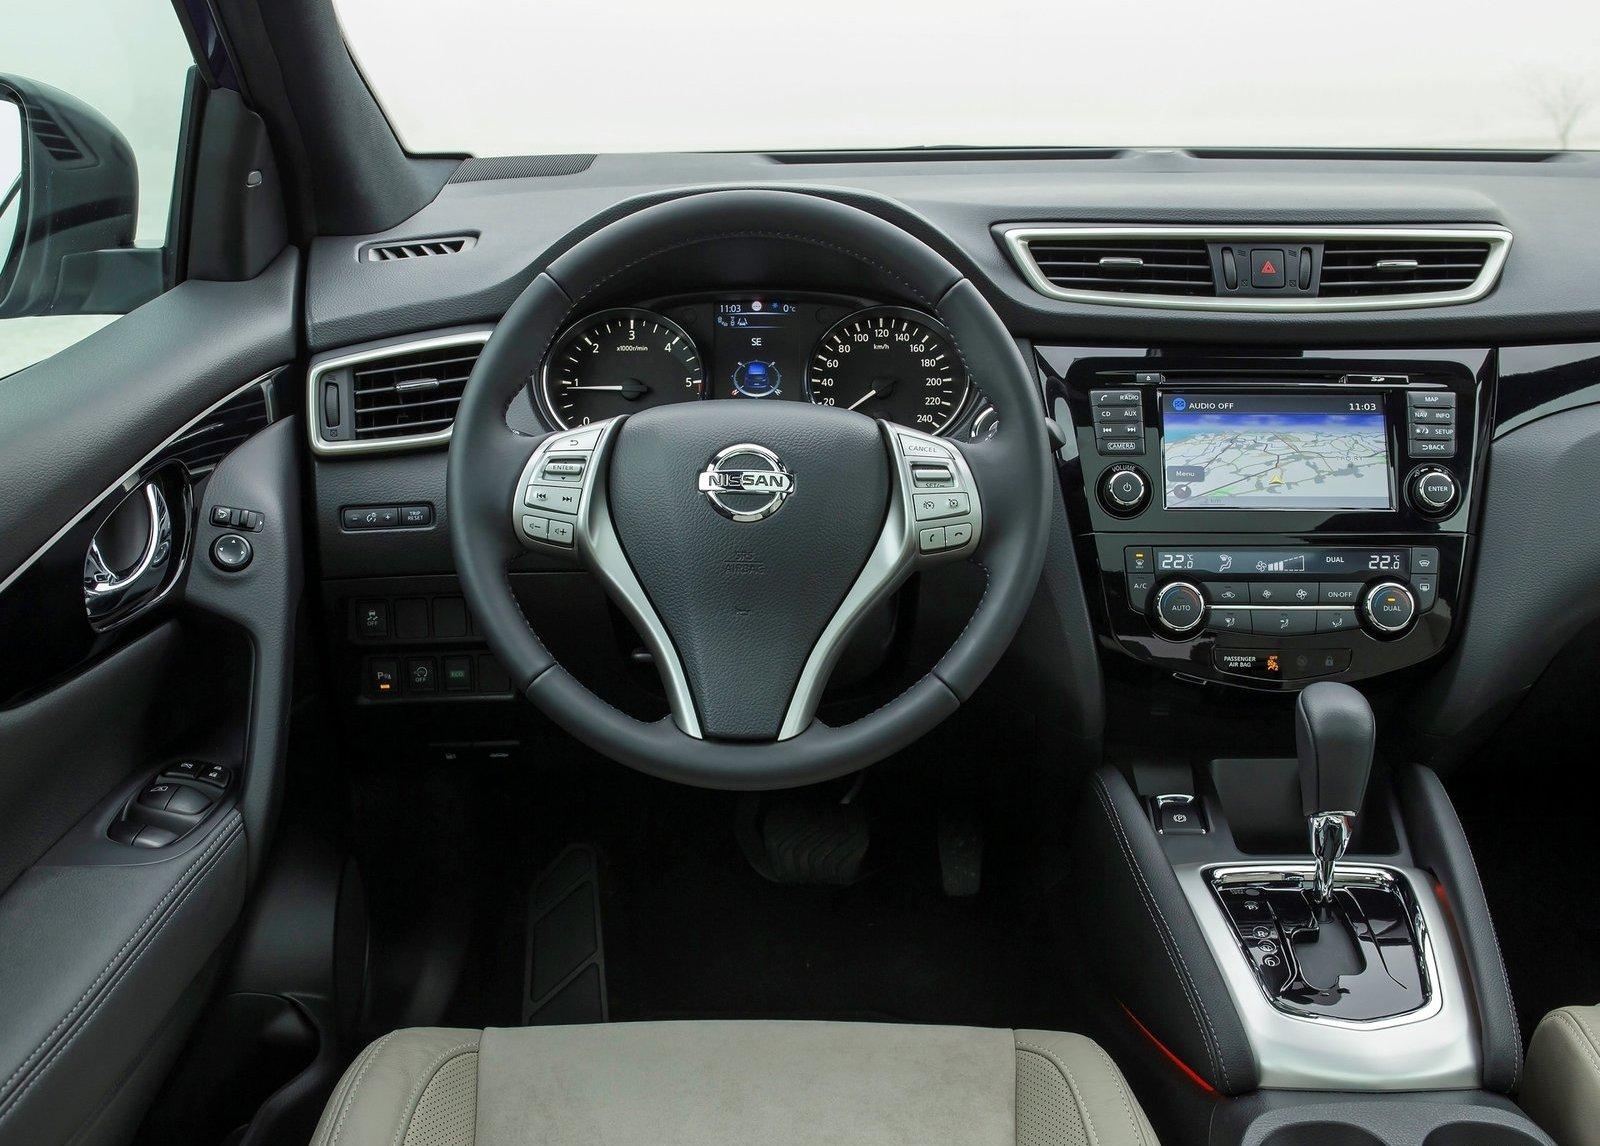 [Resim: Yeni-Nissan-Qashqai-2014-05.jpg]